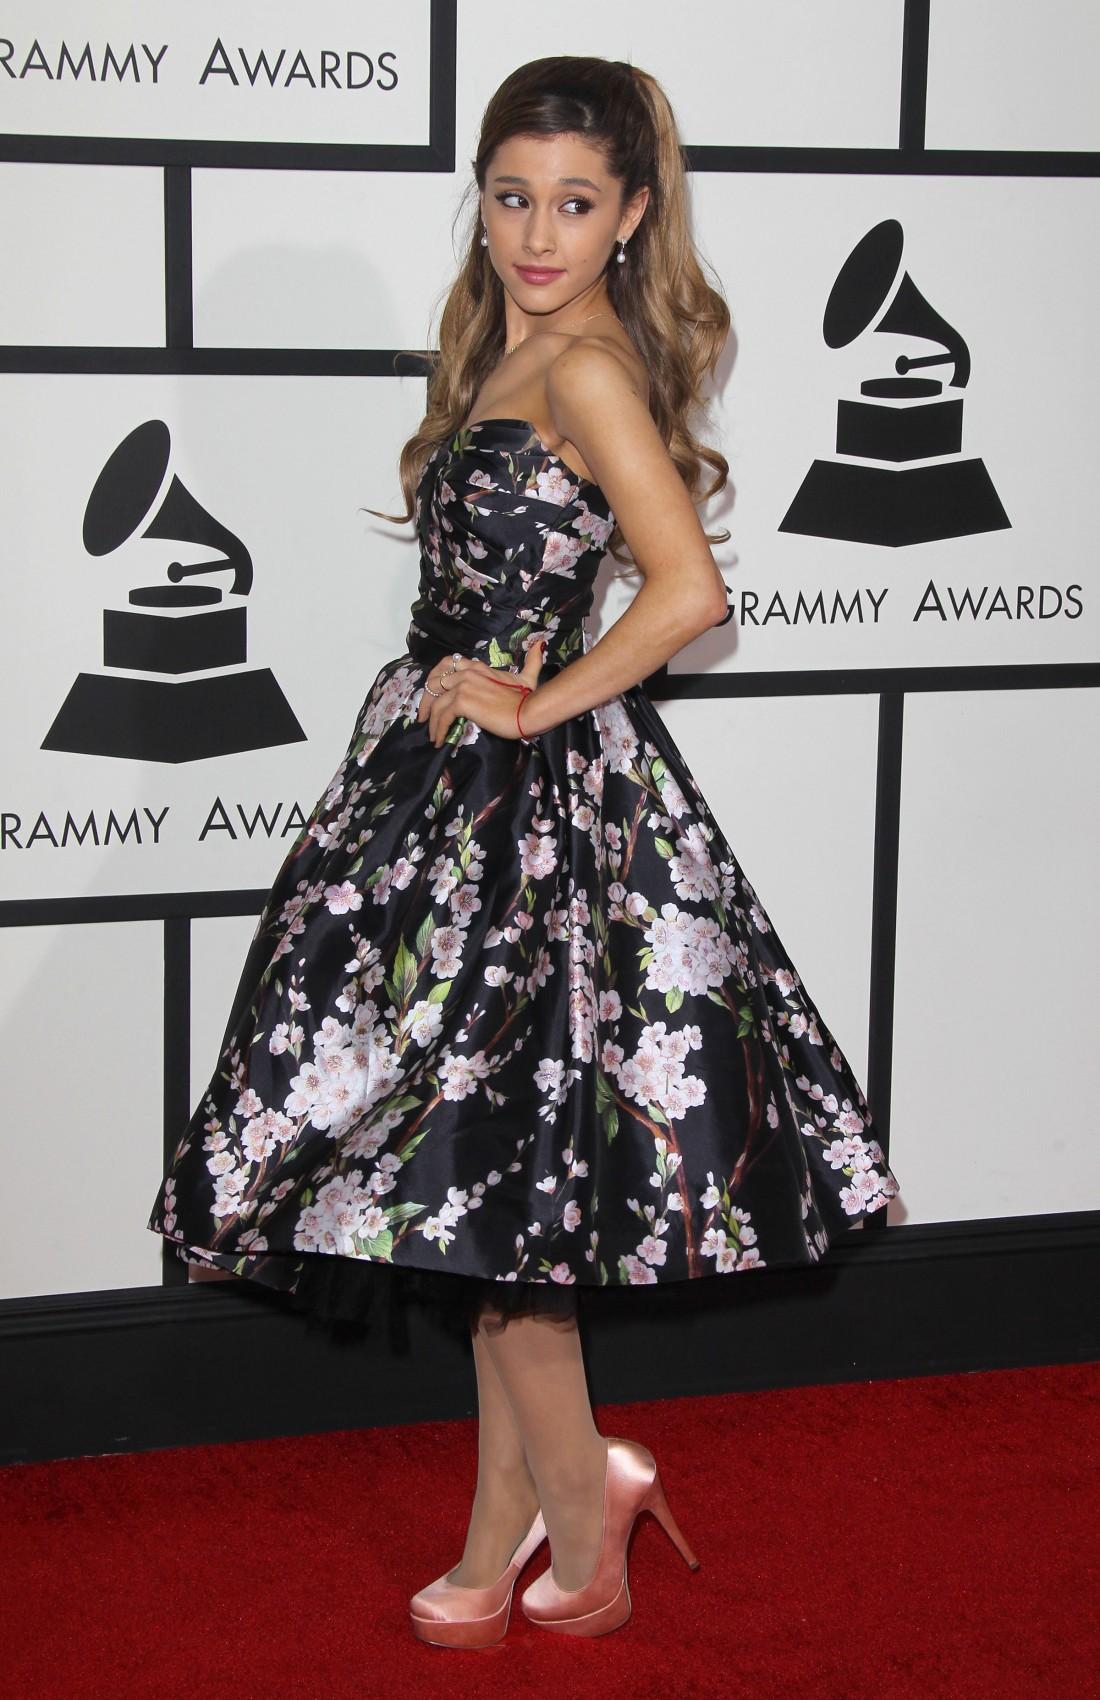 2. Ariana Grande